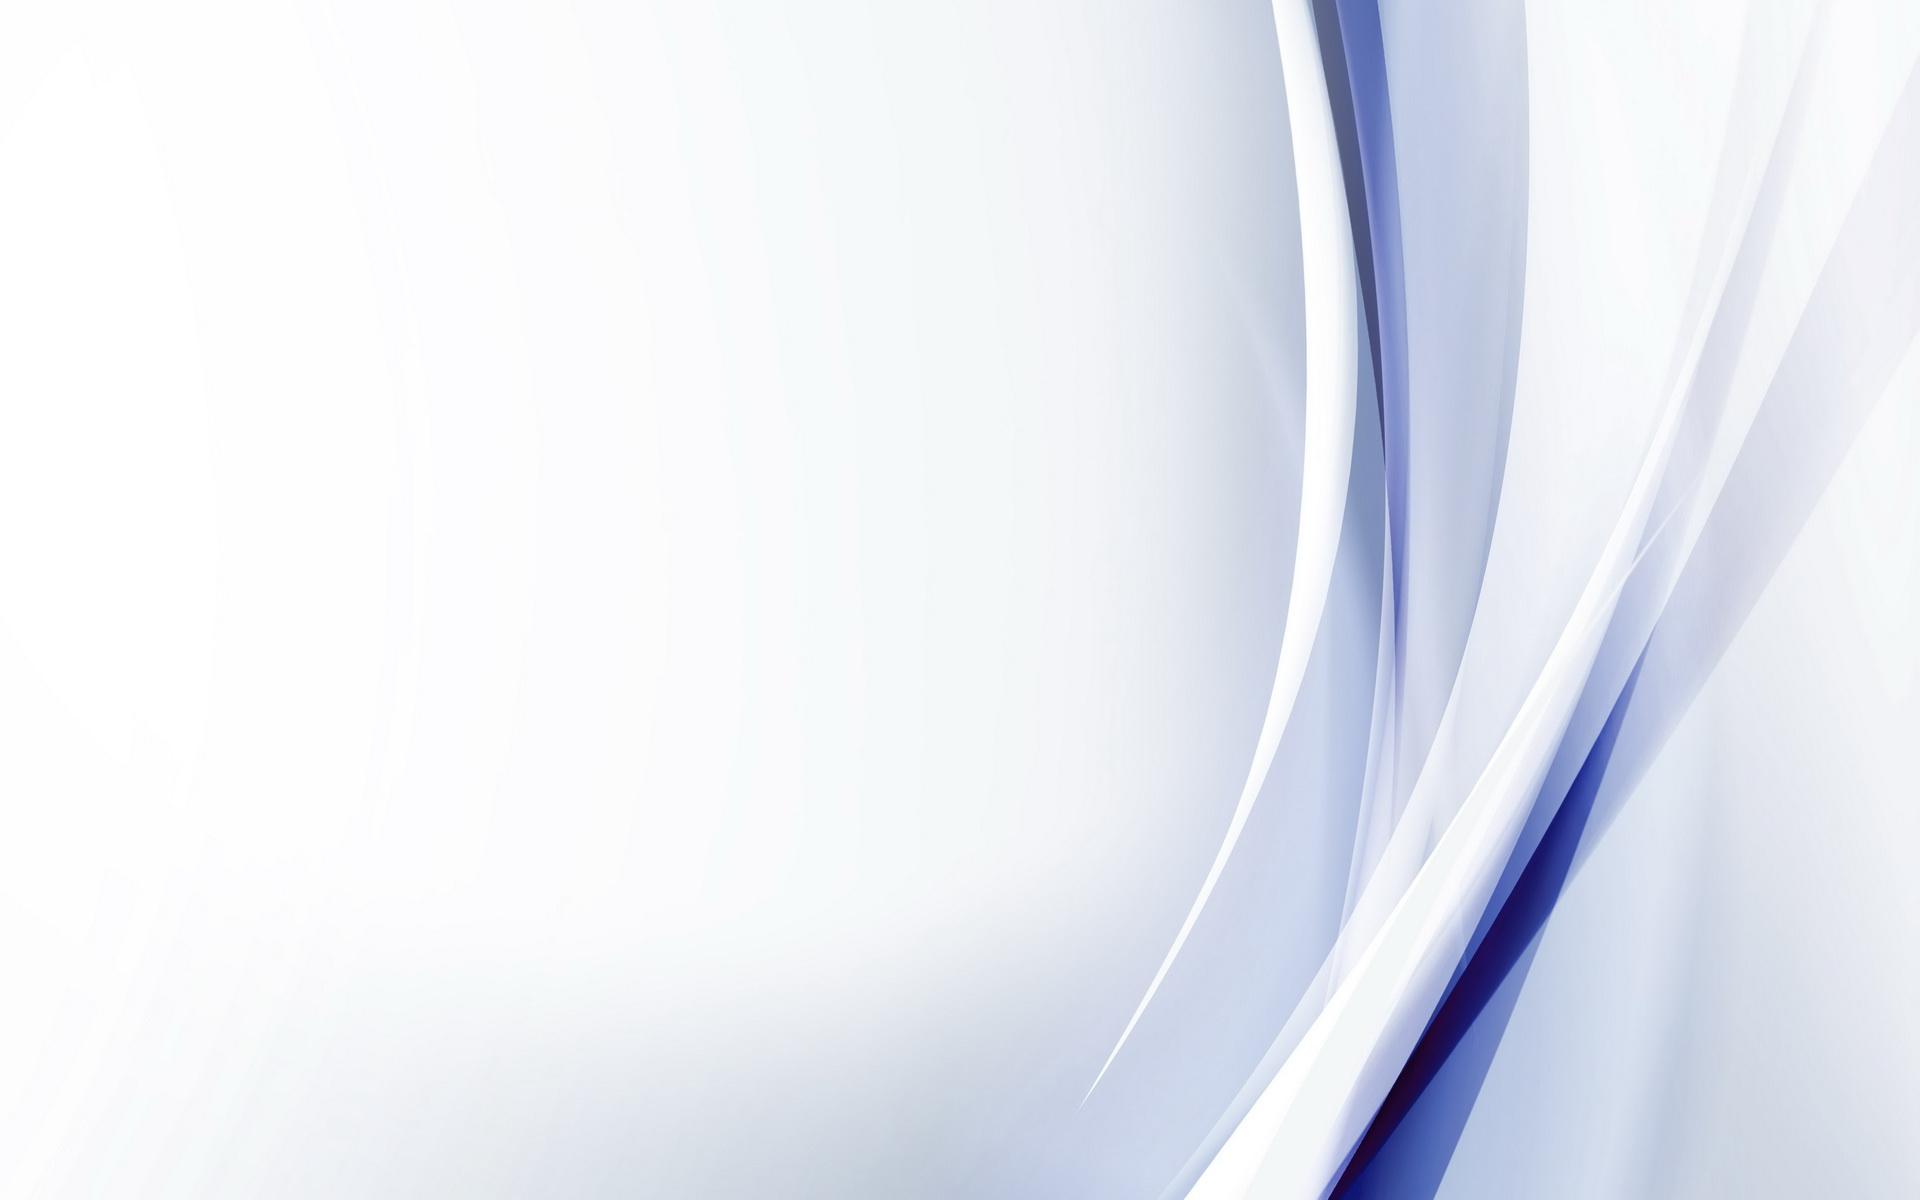 download Blue And White Pattern Wallpaper Pattern white blue 1920x1200